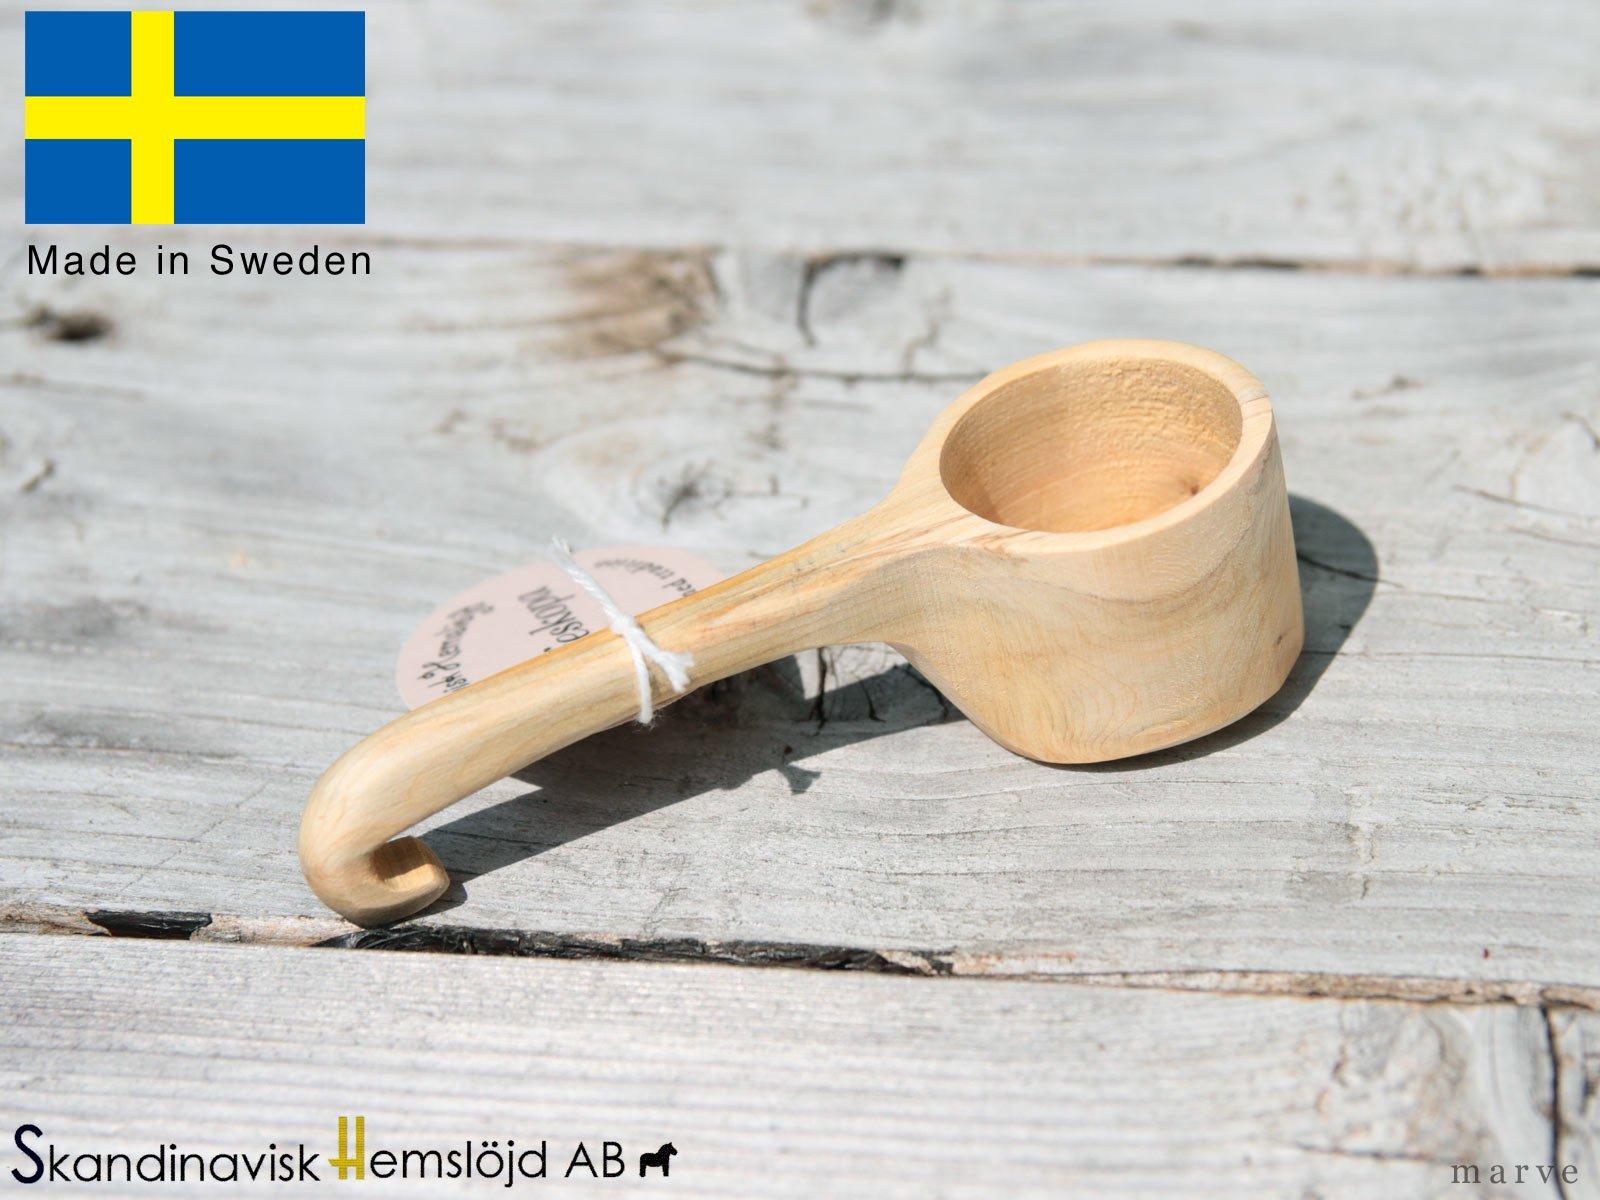 Skandinavisk Hemslojd AB カフェスコップS<img class='new_mark_img2' src='https://img.shop-pro.jp/img/new/icons55.gif' style='border:none;display:inline;margin:0px;padding:0px;width:auto;' />